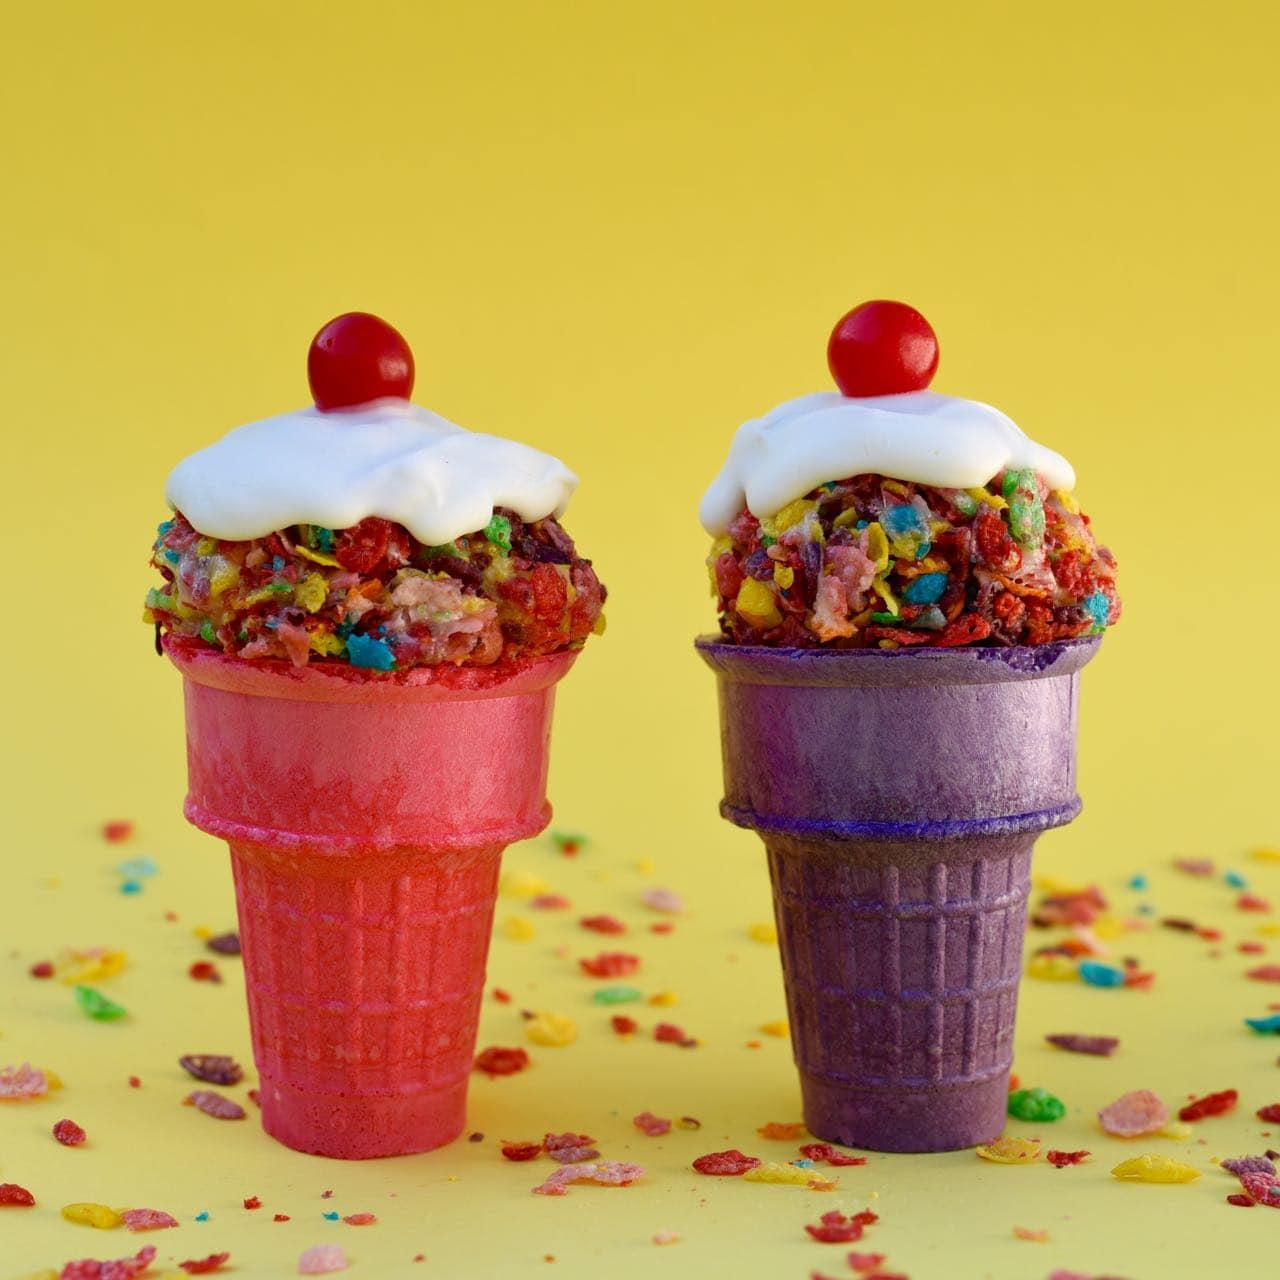 Ice cream for kids - like a drug